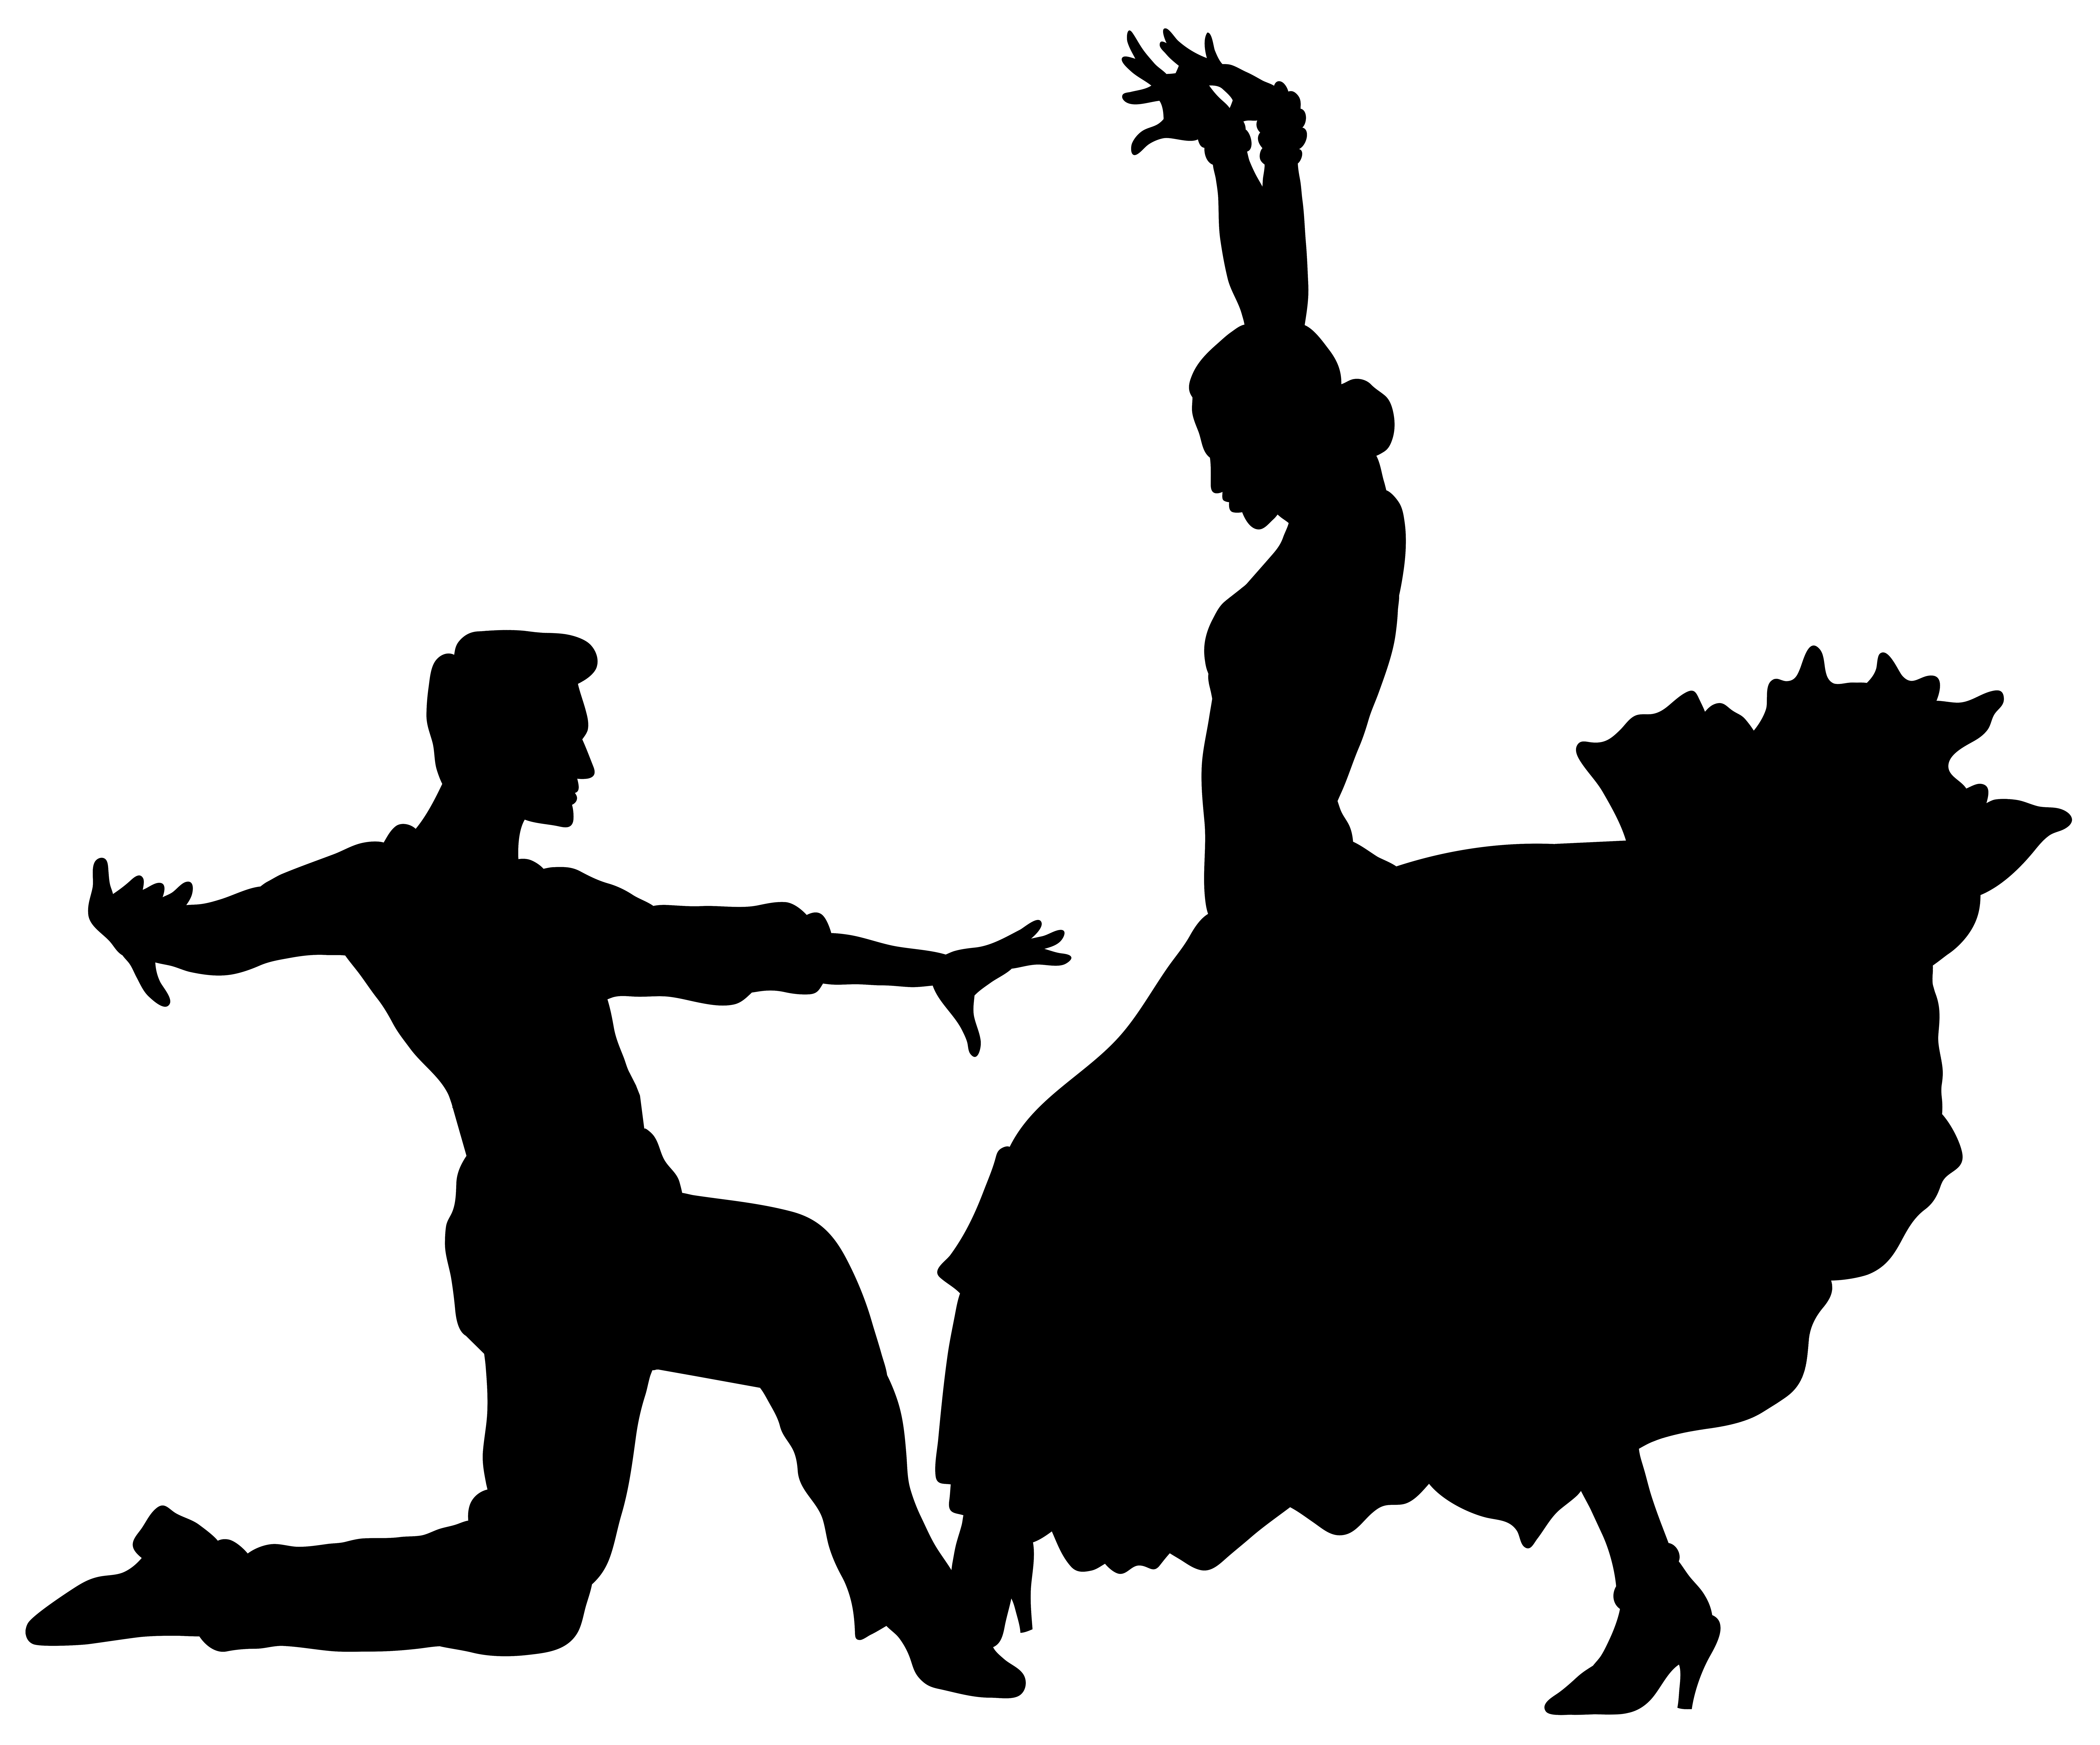 8000x6649 Pin by Pat Jimenez on Art Pinterest Dancer silhouette